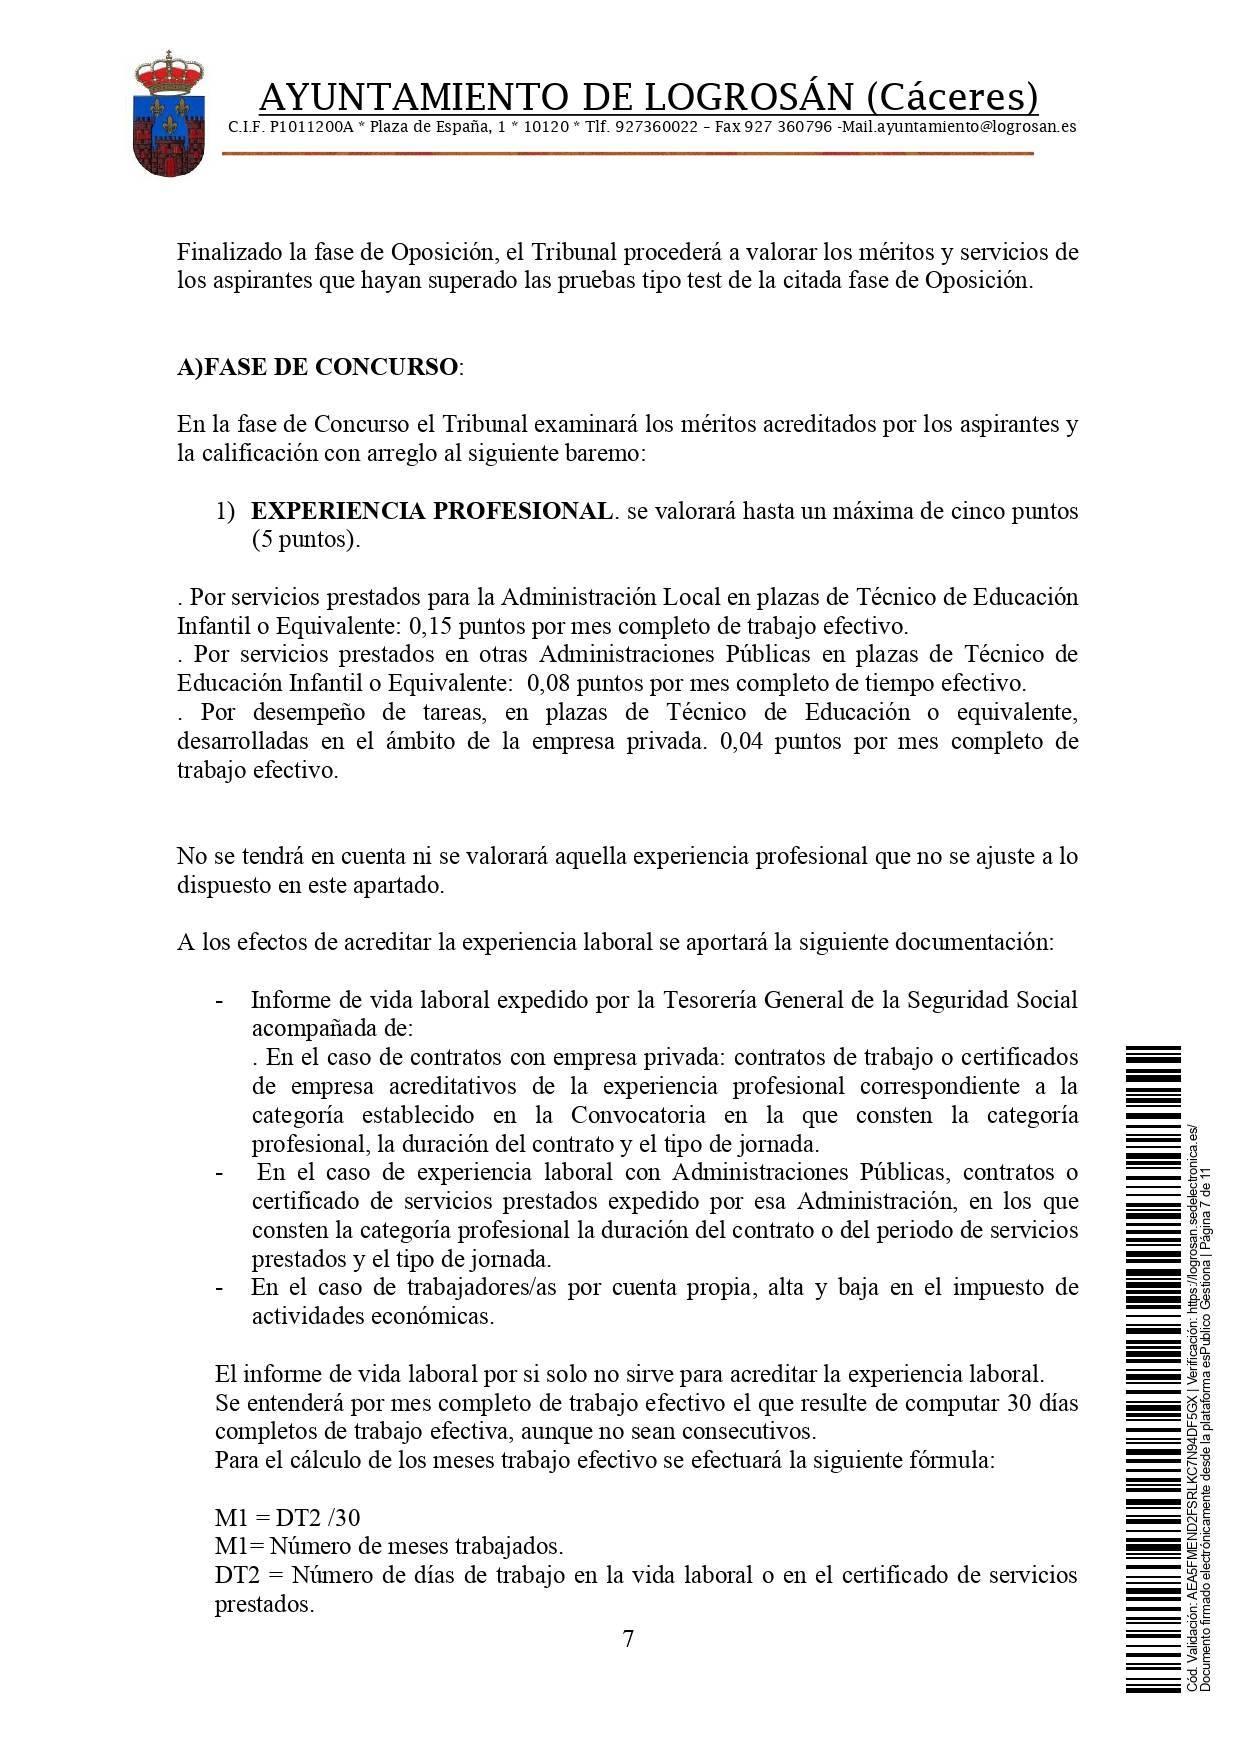 Bolsa de técnicos-as en educación infantil (2021) - Logrosán (Cáceres) 7